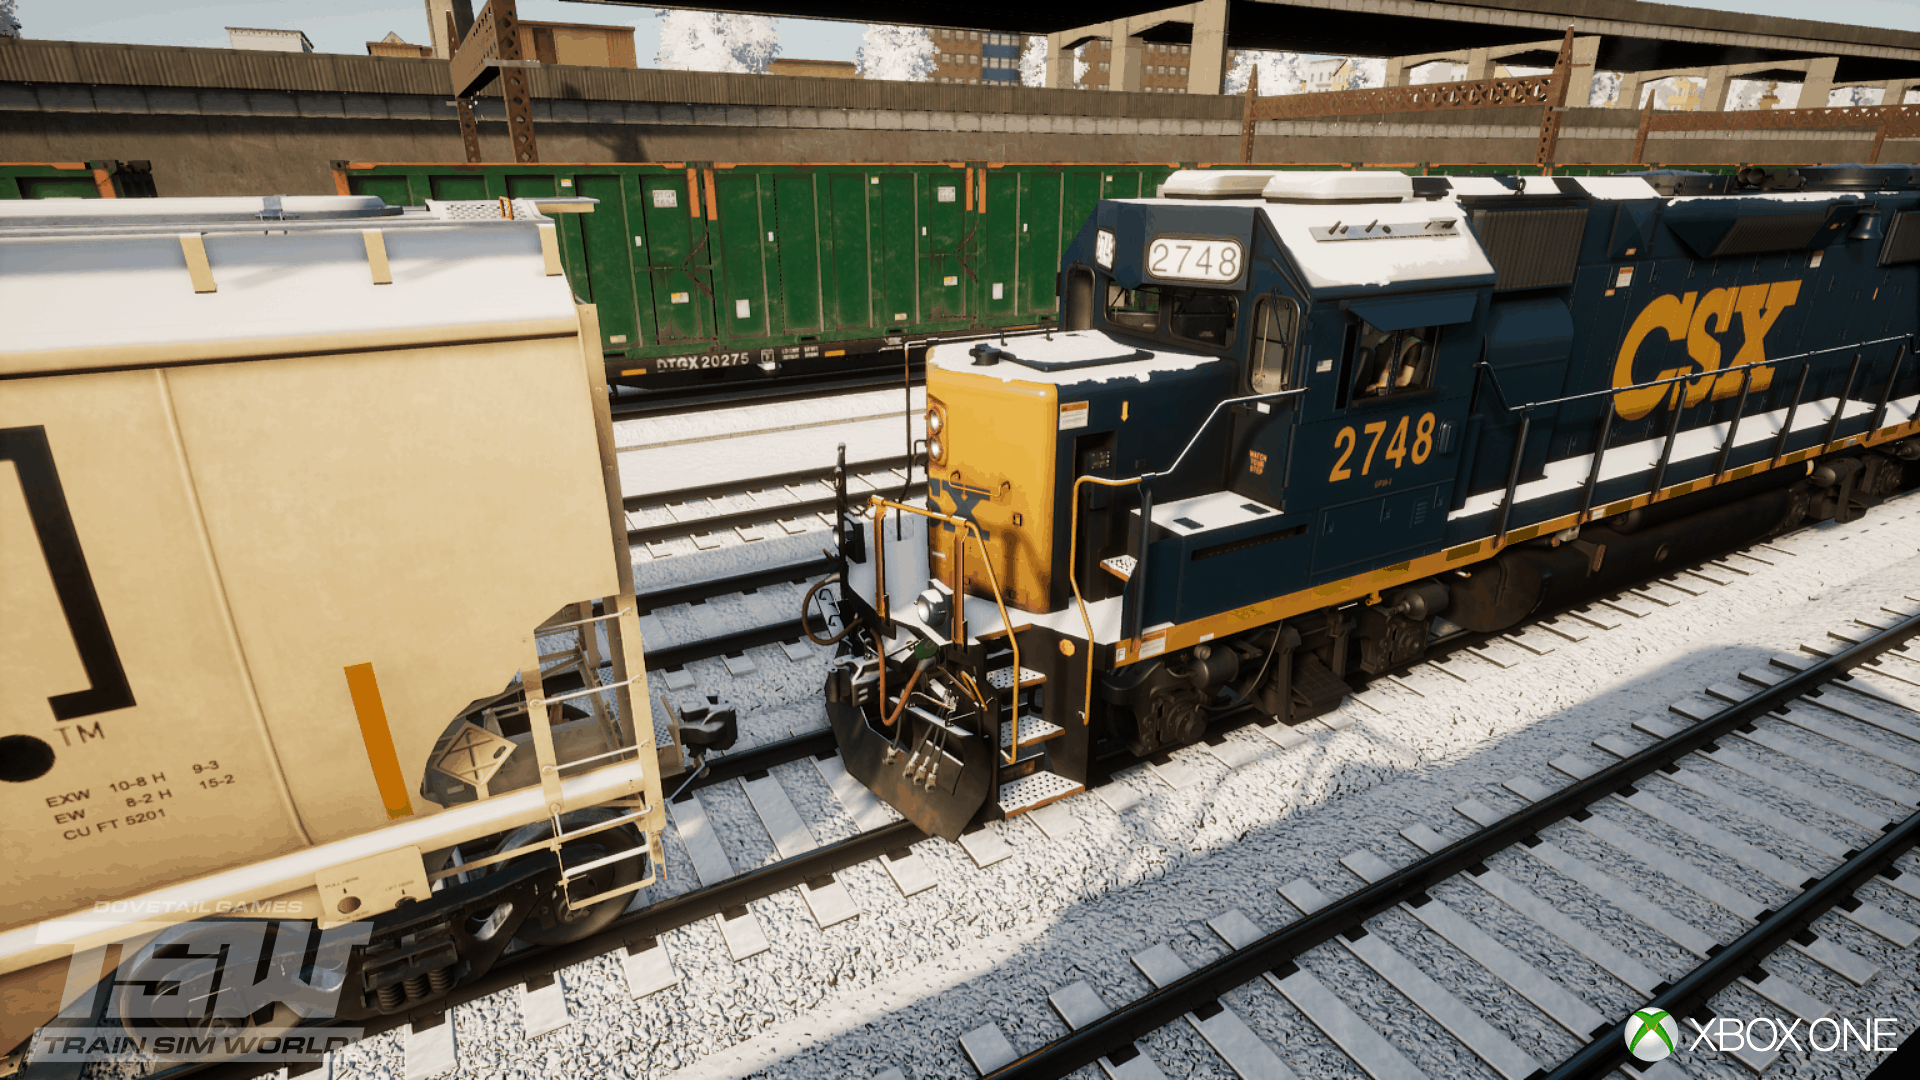 All Aboard for Train Sim World!